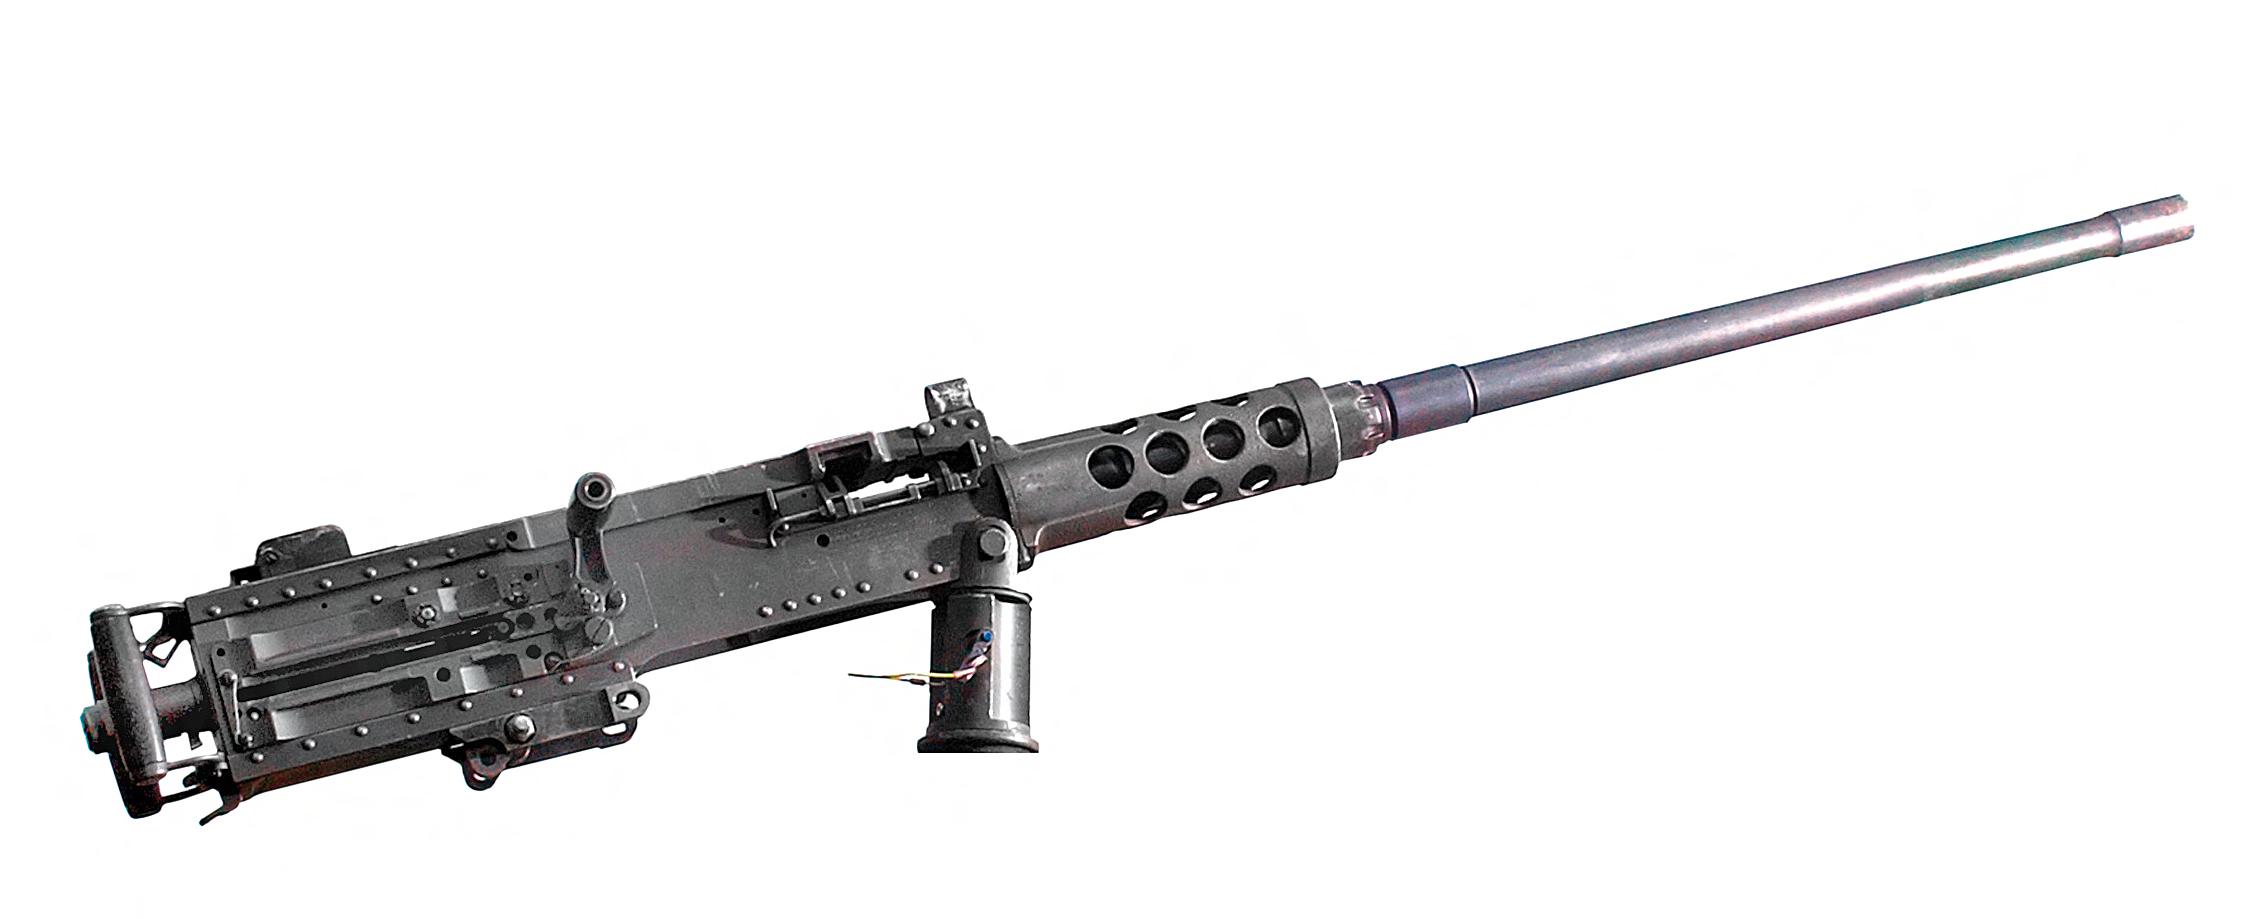 m2 50 caliber machine gun